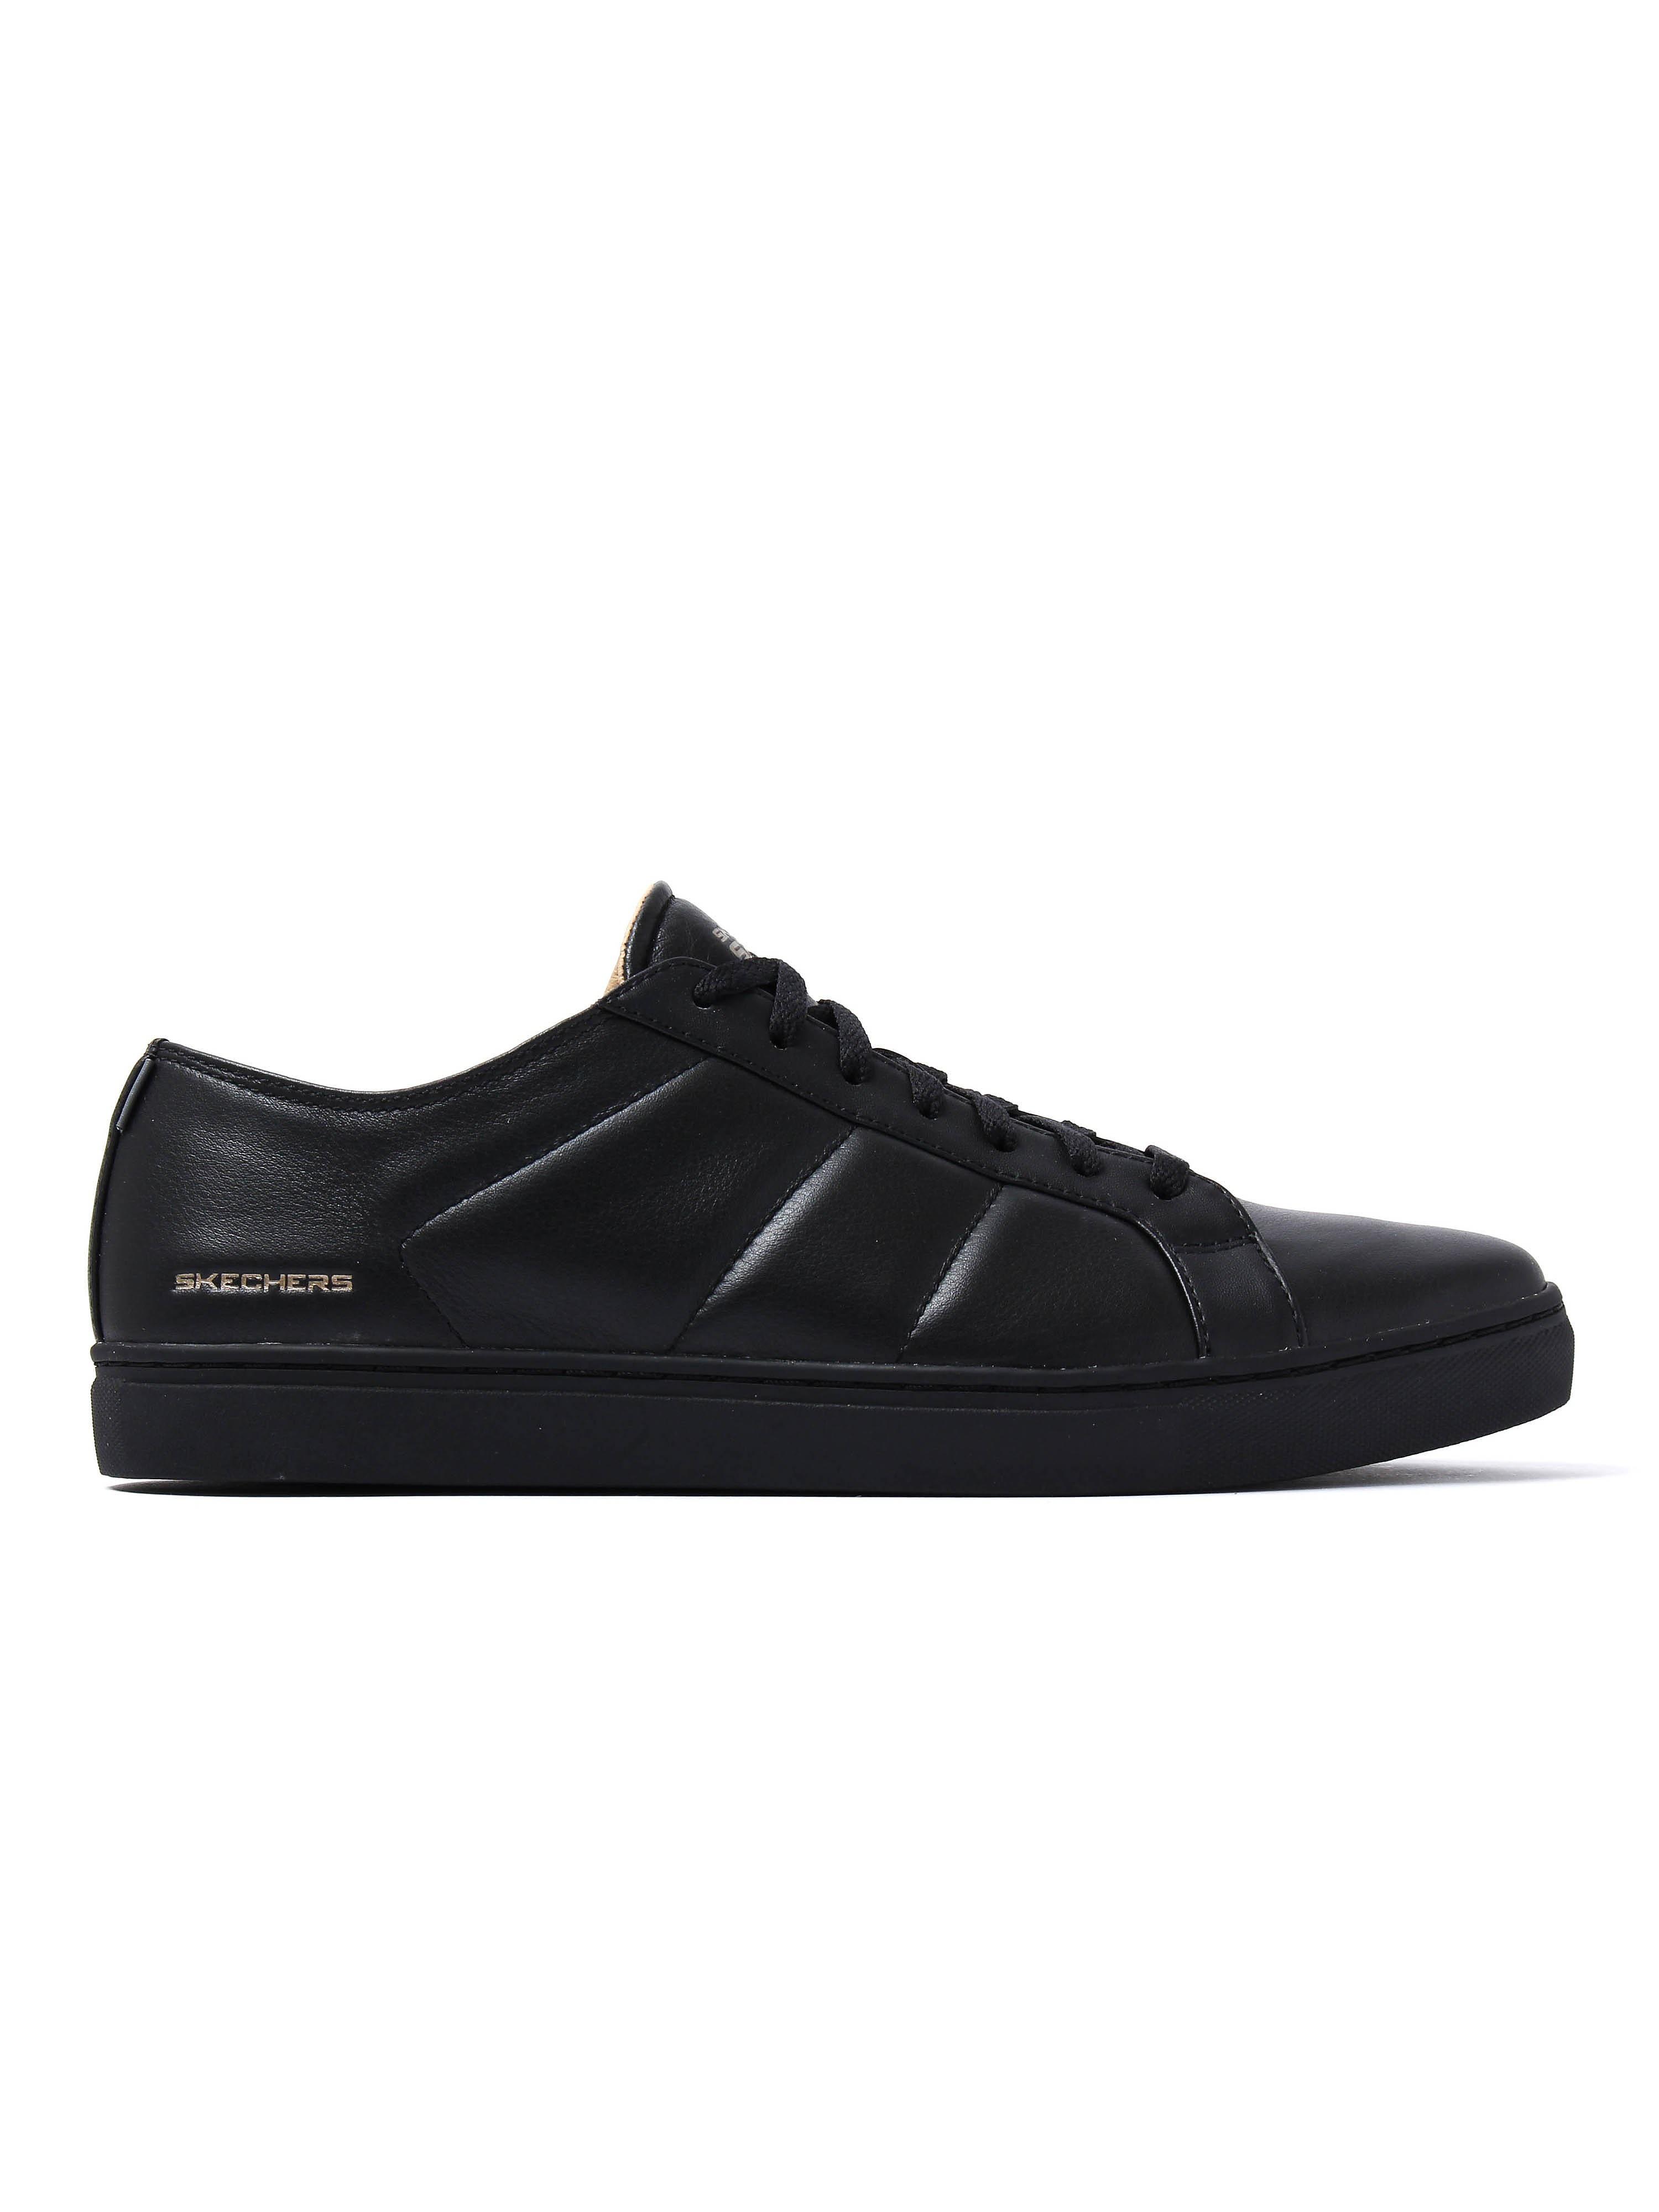 Skechers Men's Venice T Trainers - Black Leather